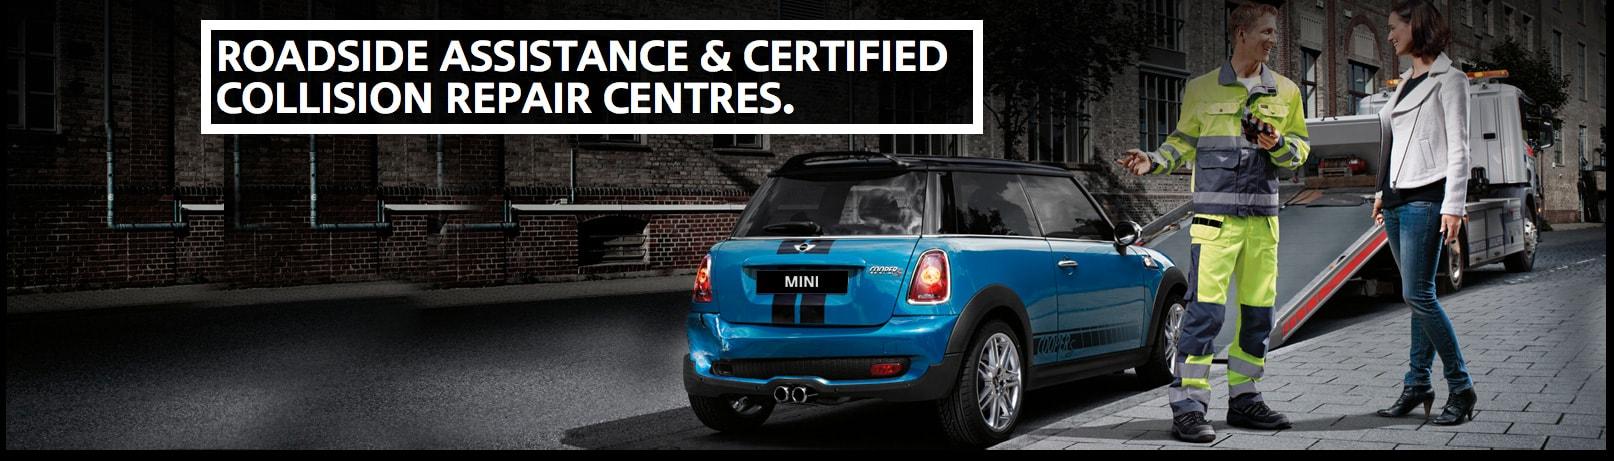 mini roadside assistance kelowna bmw new bmw dealership in kelowna. Cars Review. Best American Auto & Cars Review